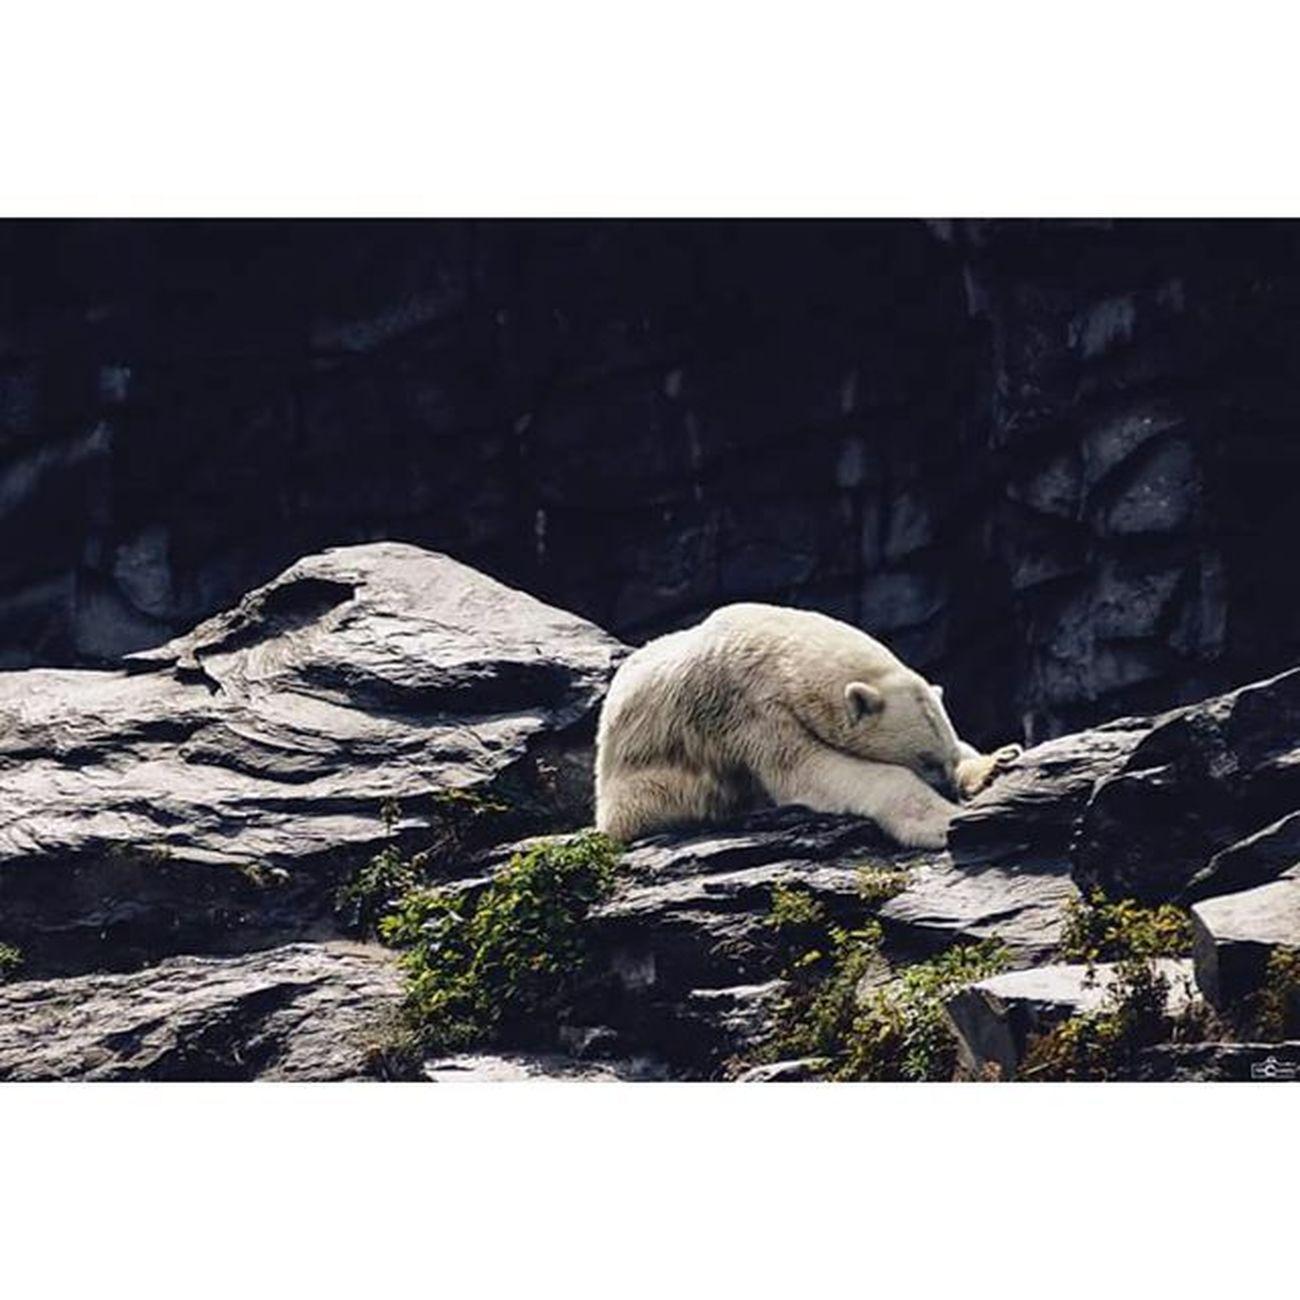 Michaellangerfotografie Animal Polarbear Fotografie Photography Photographyislife CripixtMovement